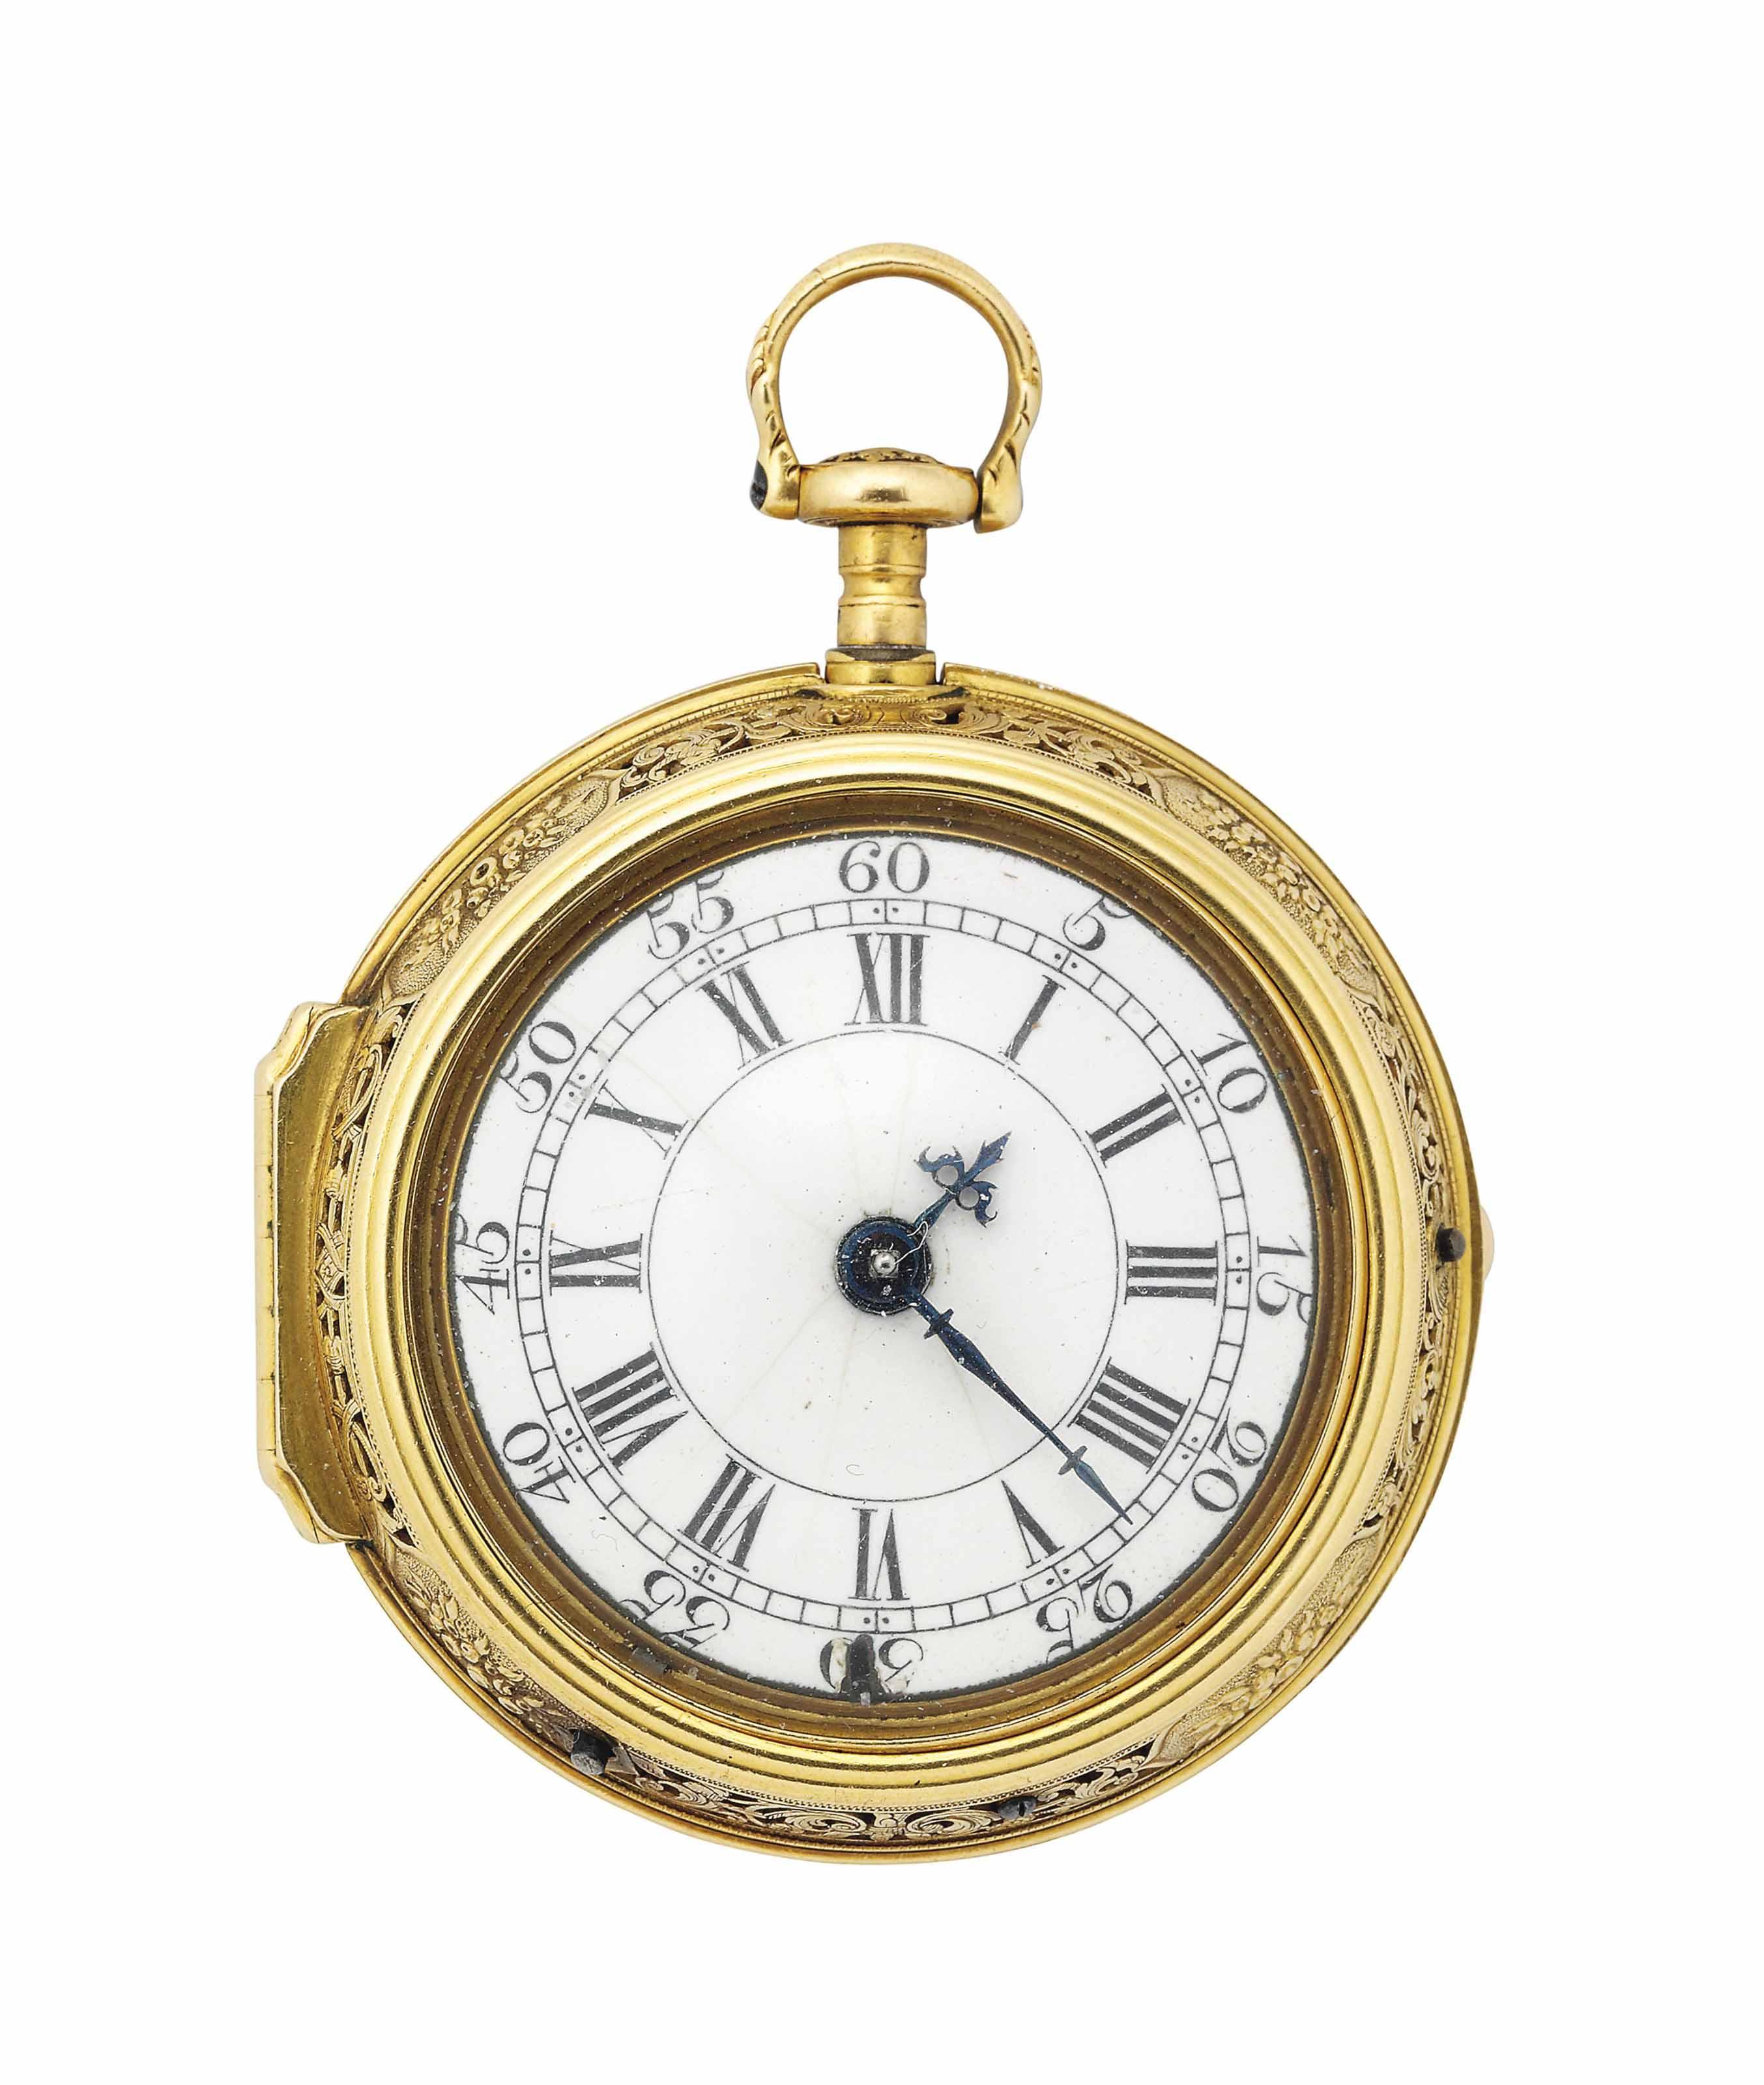 An 18th century English gold r